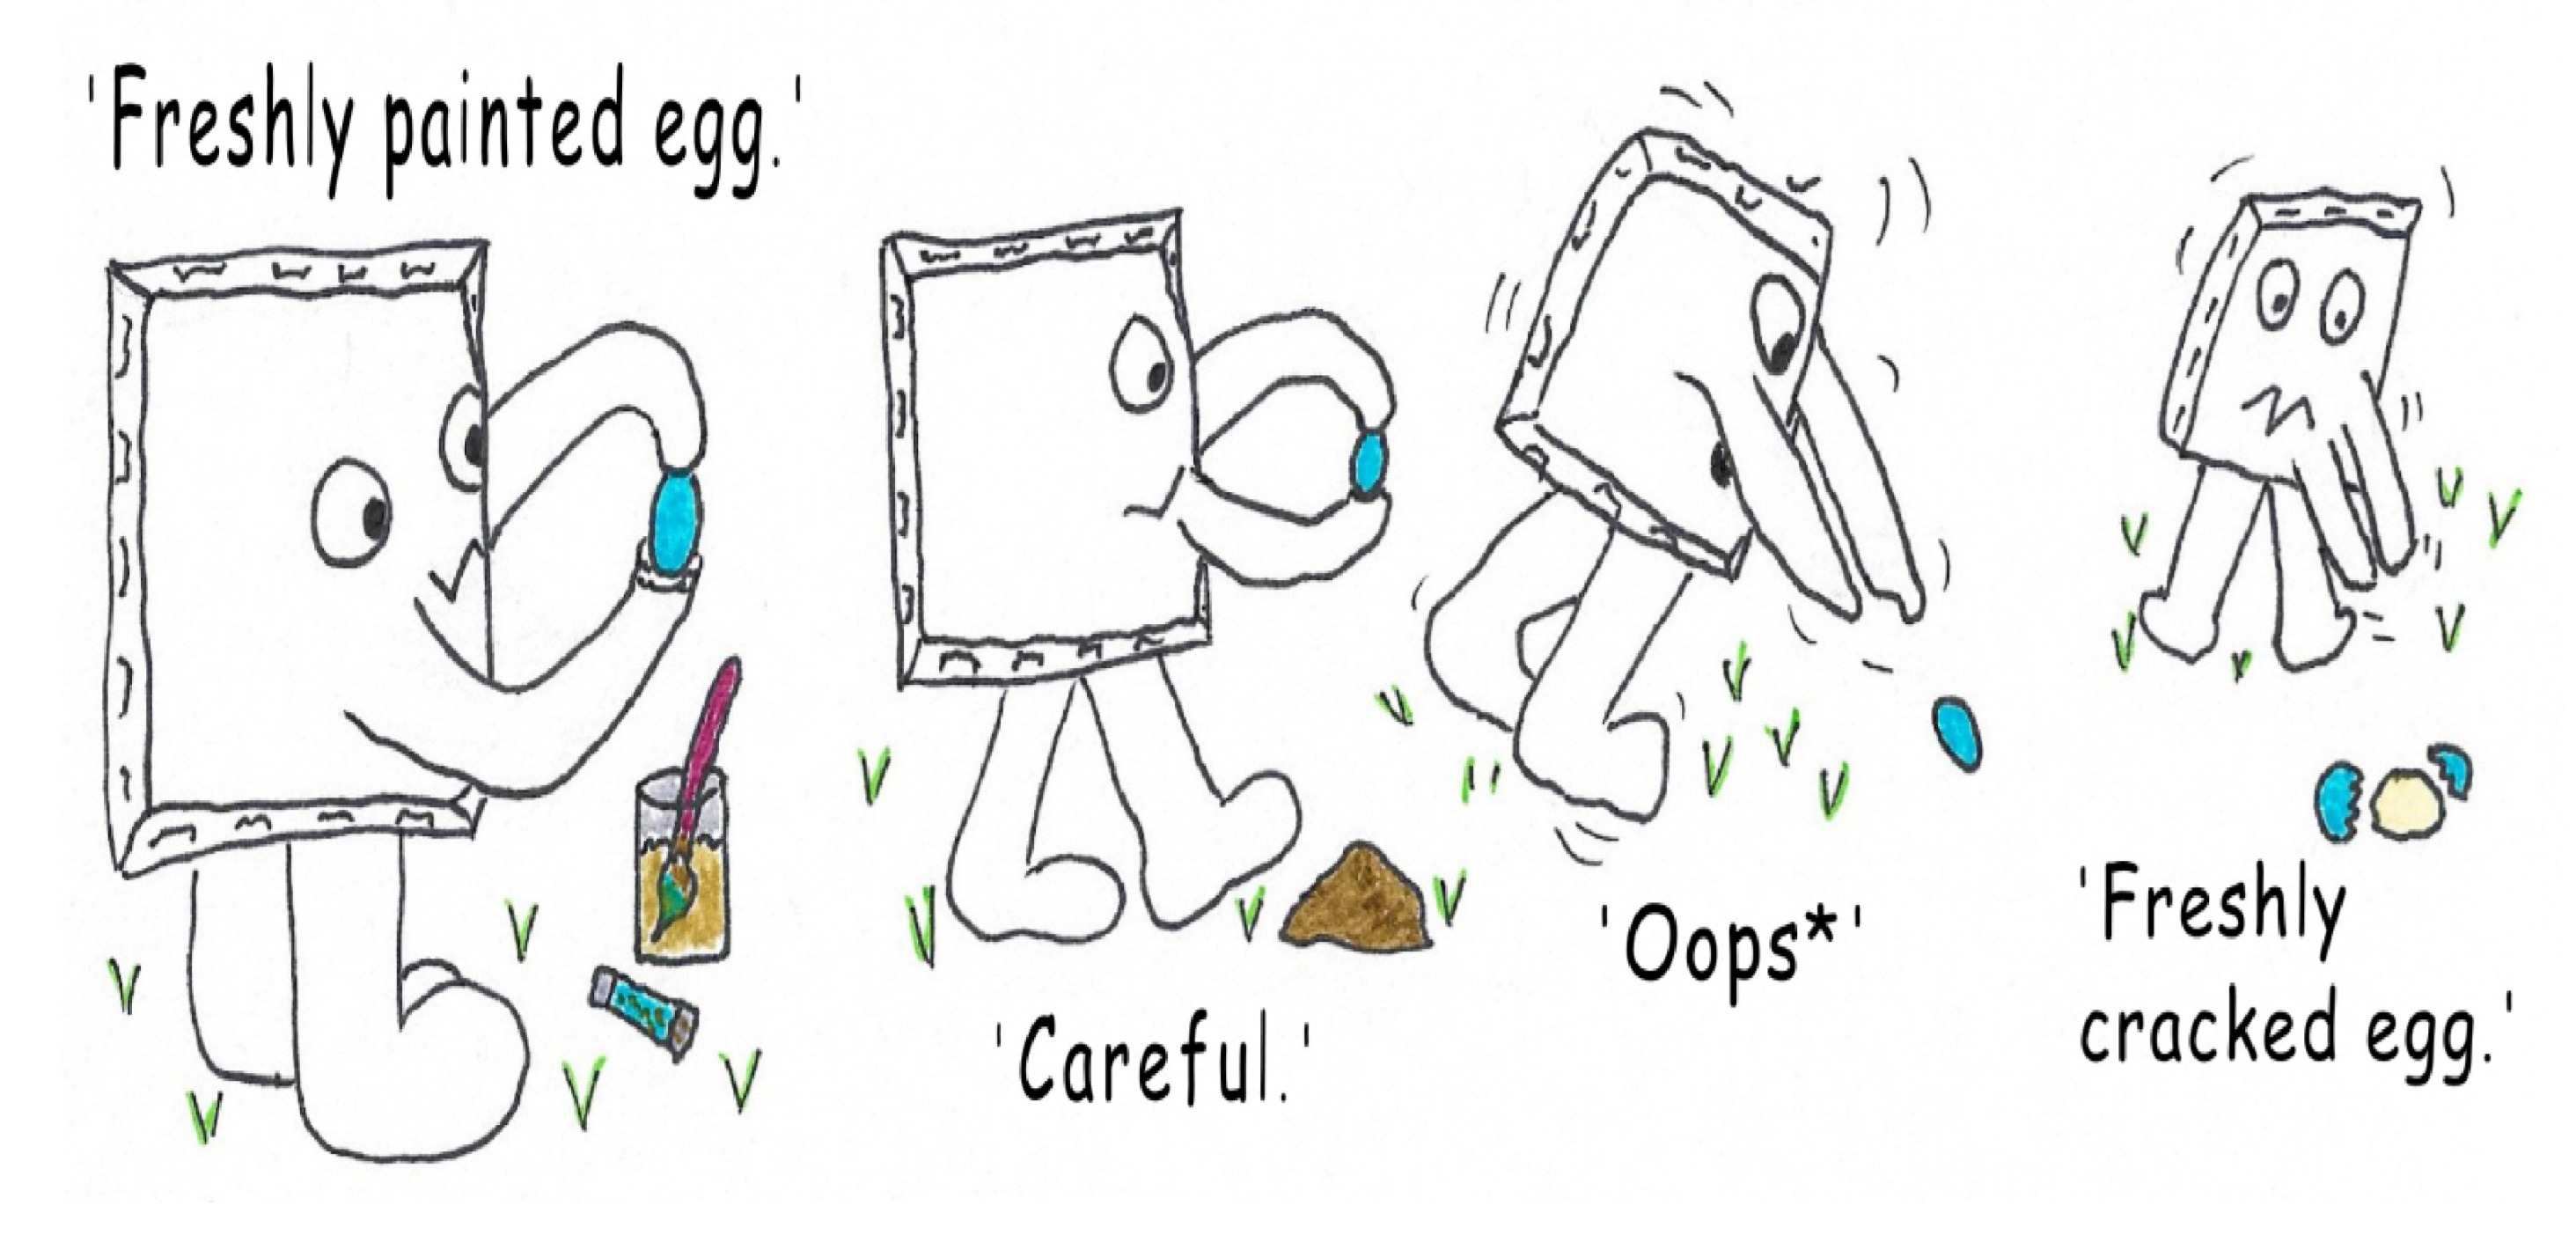 Painted egg fiasco_edited